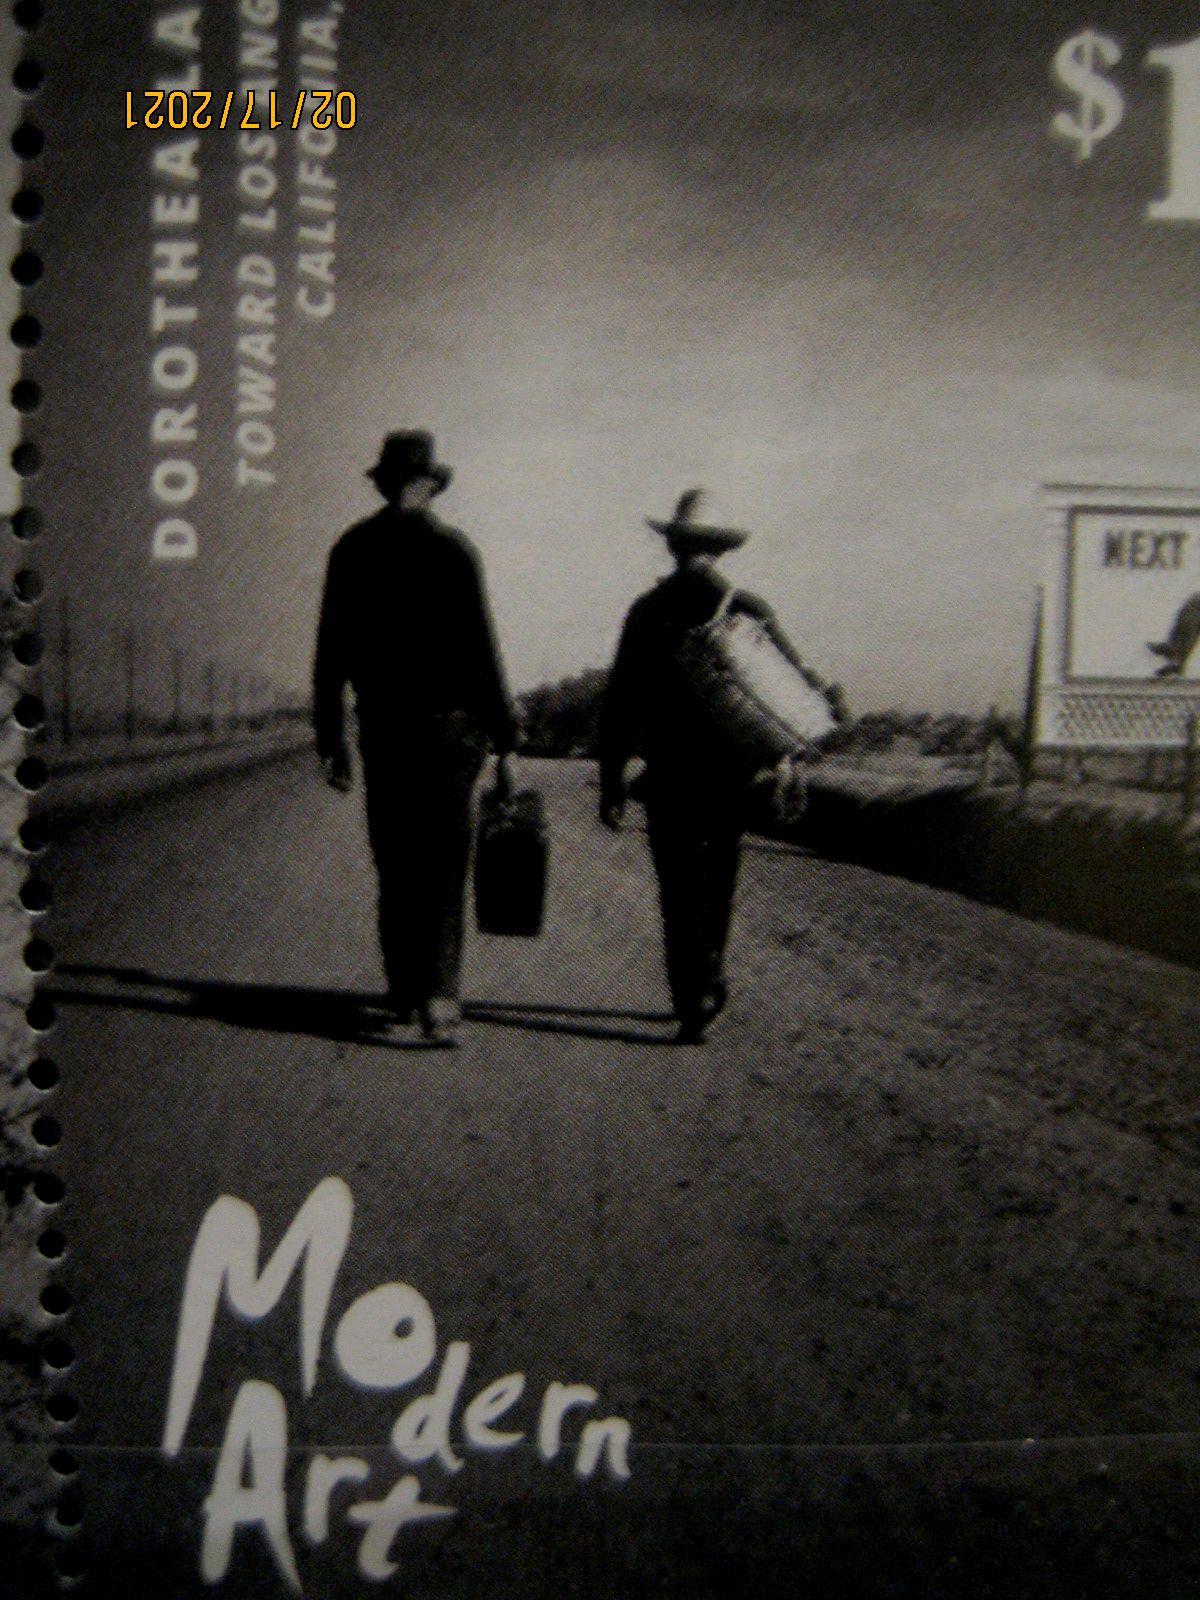 марка Палау 2014-01-02, Современная фотография, Mi:PW 3430, «К Лос-Анджелесу» (1937), Доротея Ланж, номинал — 1.50 $